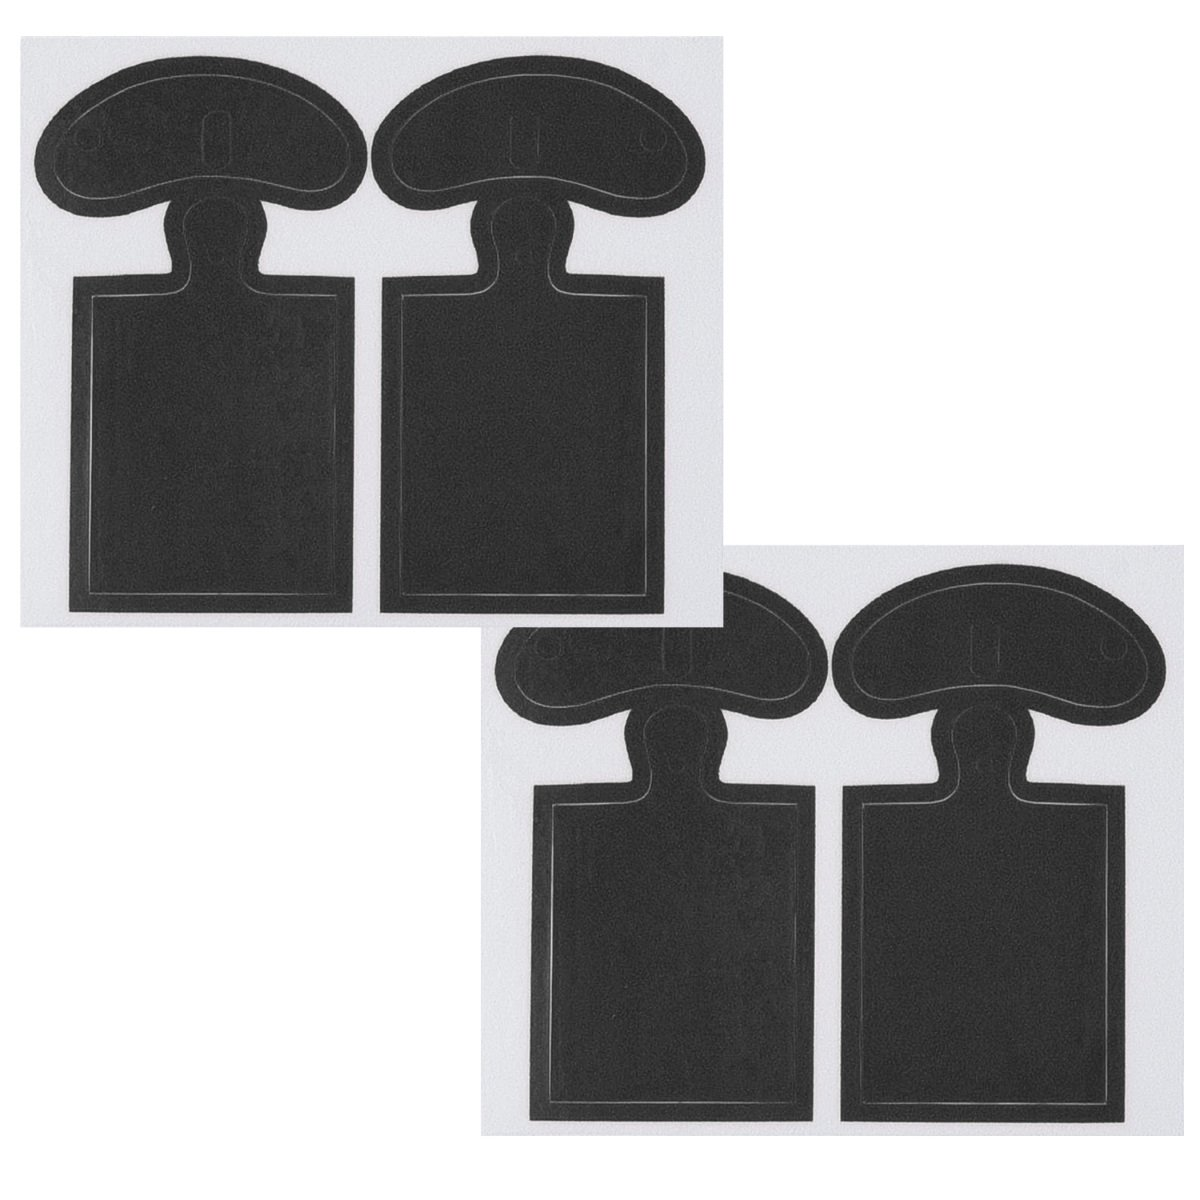 decoraci/ón de Cubierta Protectora para aud/ífonos In-Ear Juego de 4X Stickers para Auriculares Apple en Rosa Fucsia kwmobile Set 4en1 Pegatinas para Apple AirPods